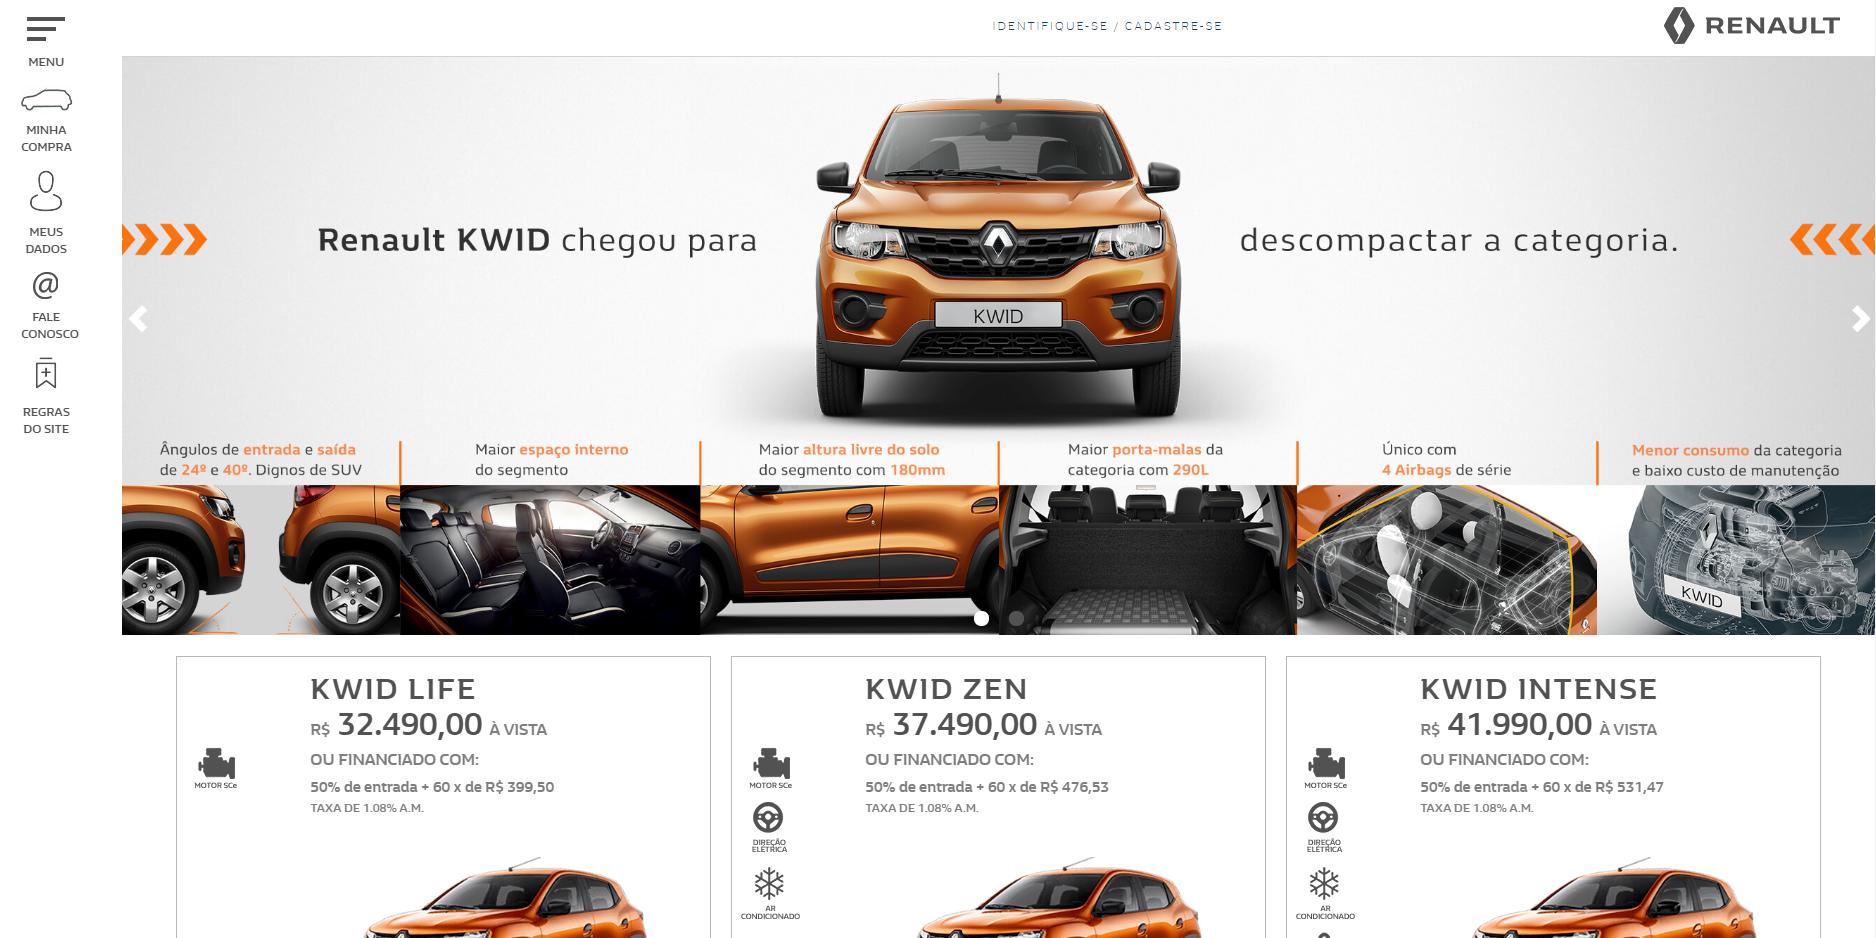 e-commerce de veículos renault kwid